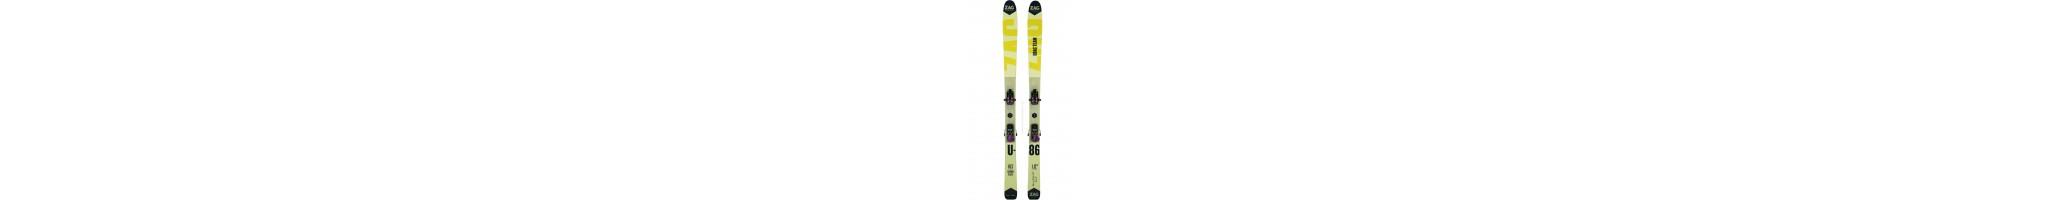 Ski de fond, ski nordique, ski skating ou alternatif pas cher sur LaBourseAuxSkis®